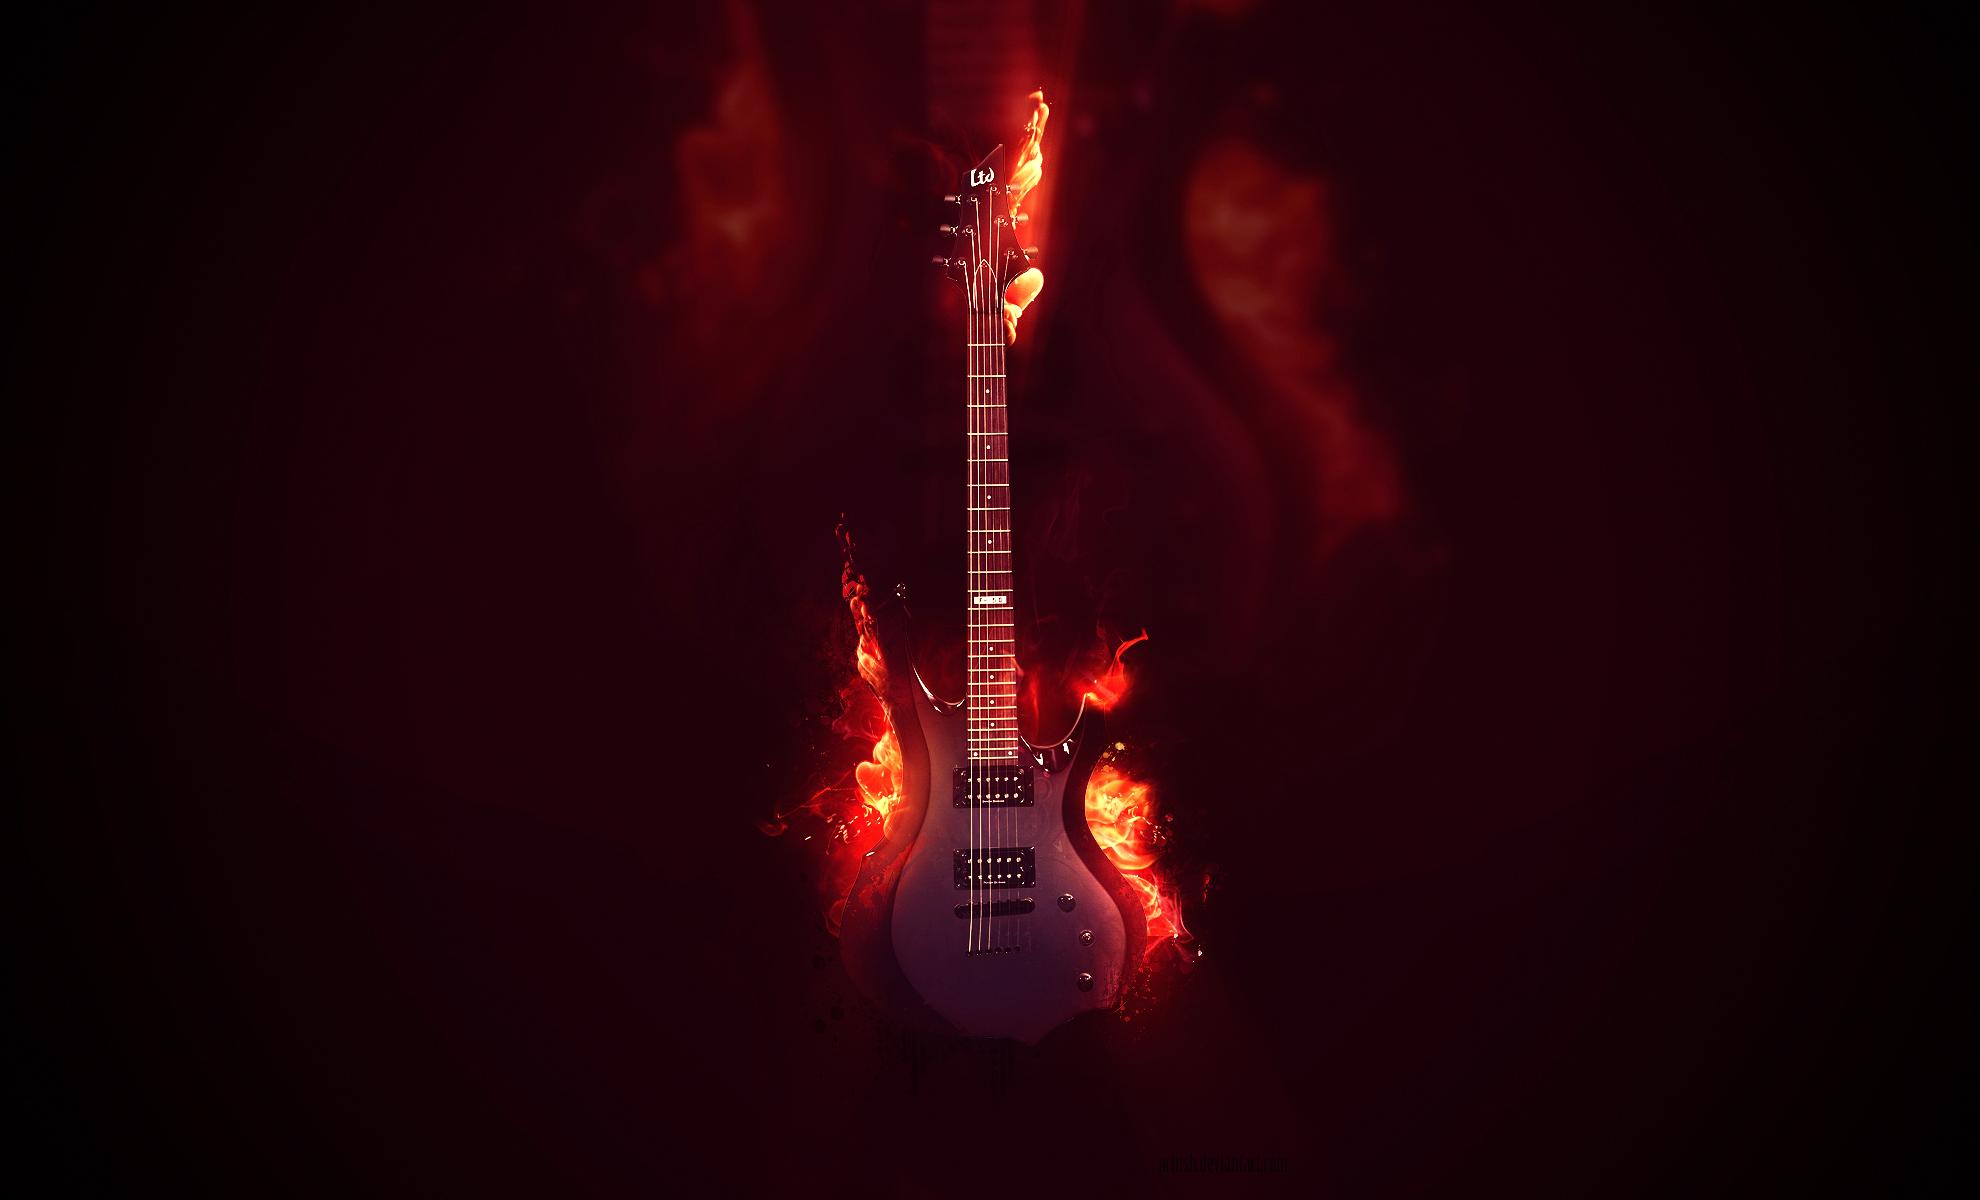 guitar wallpaper by artush -#main